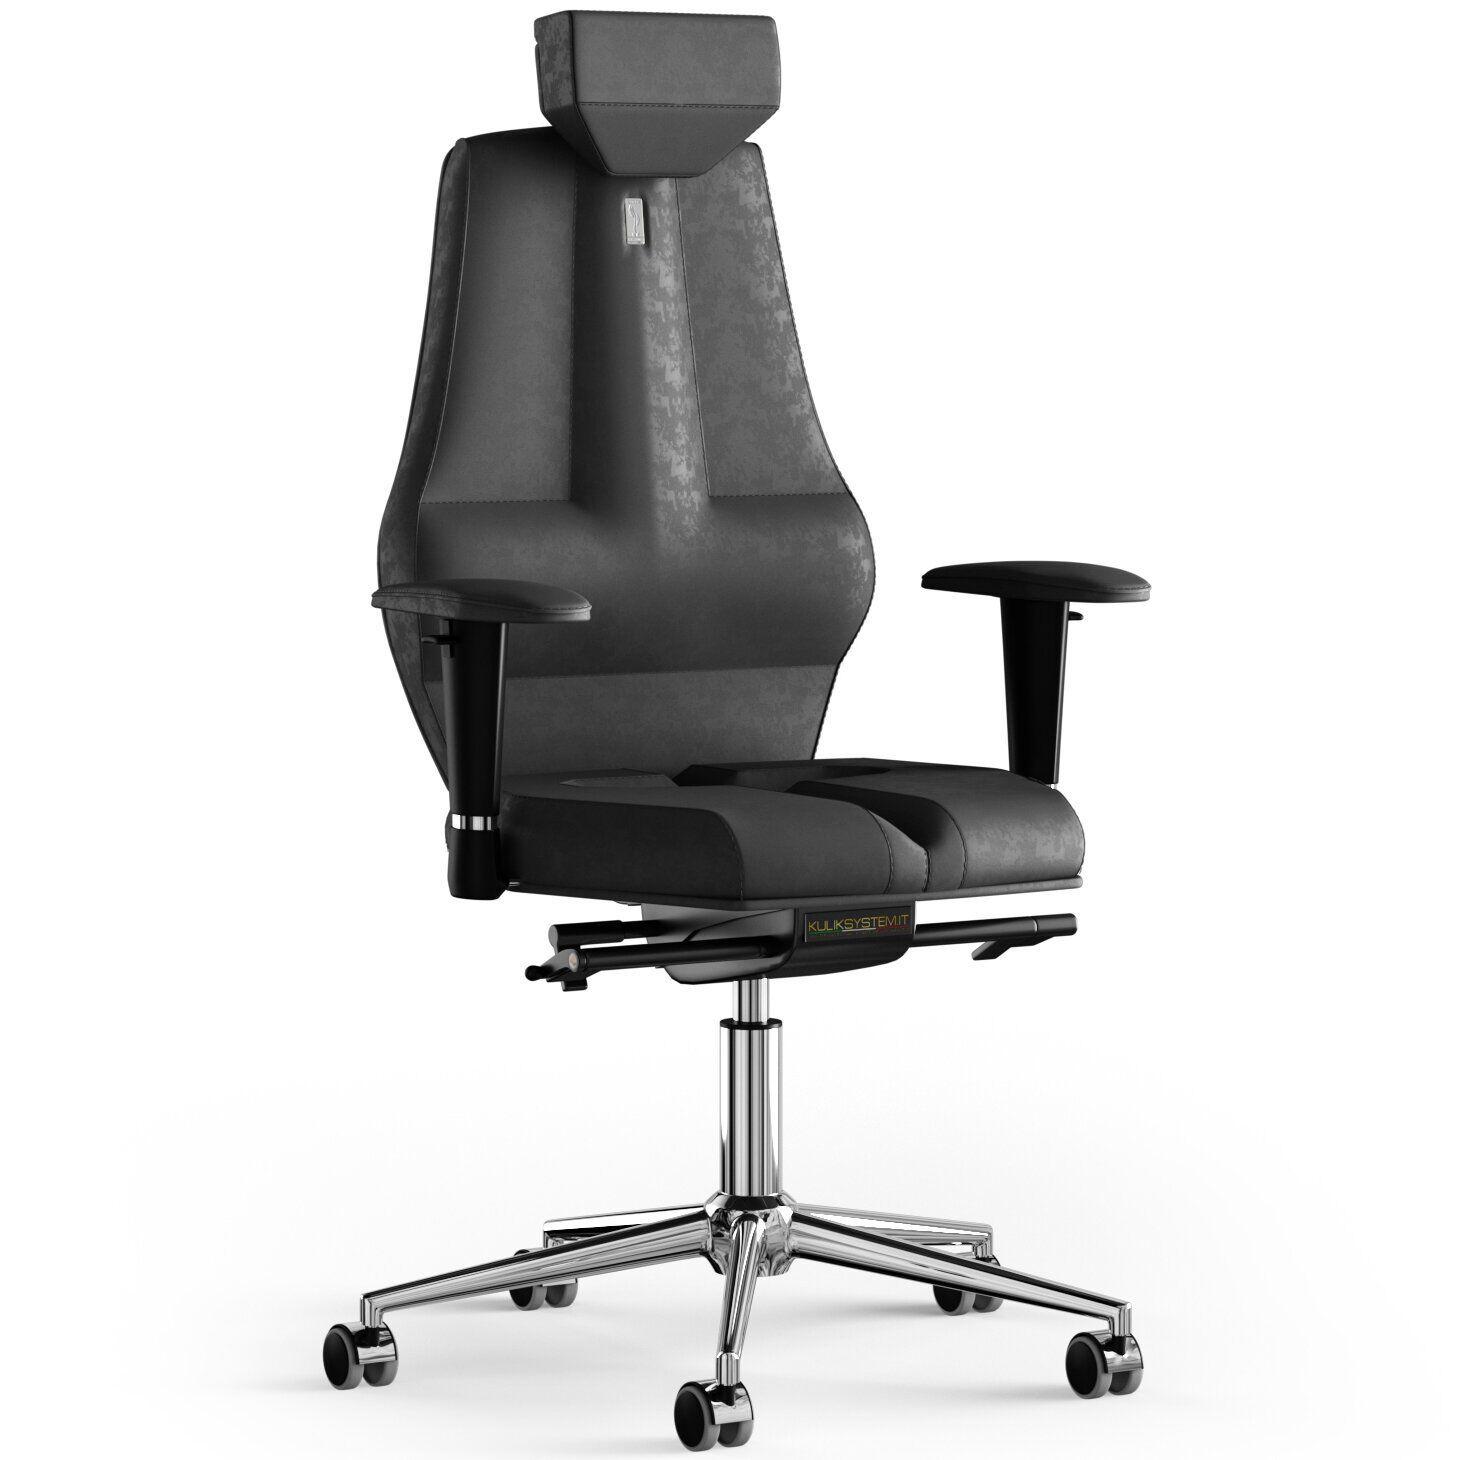 Кресло KULIK SYSTEM NANO Антара с подголовником без строчки